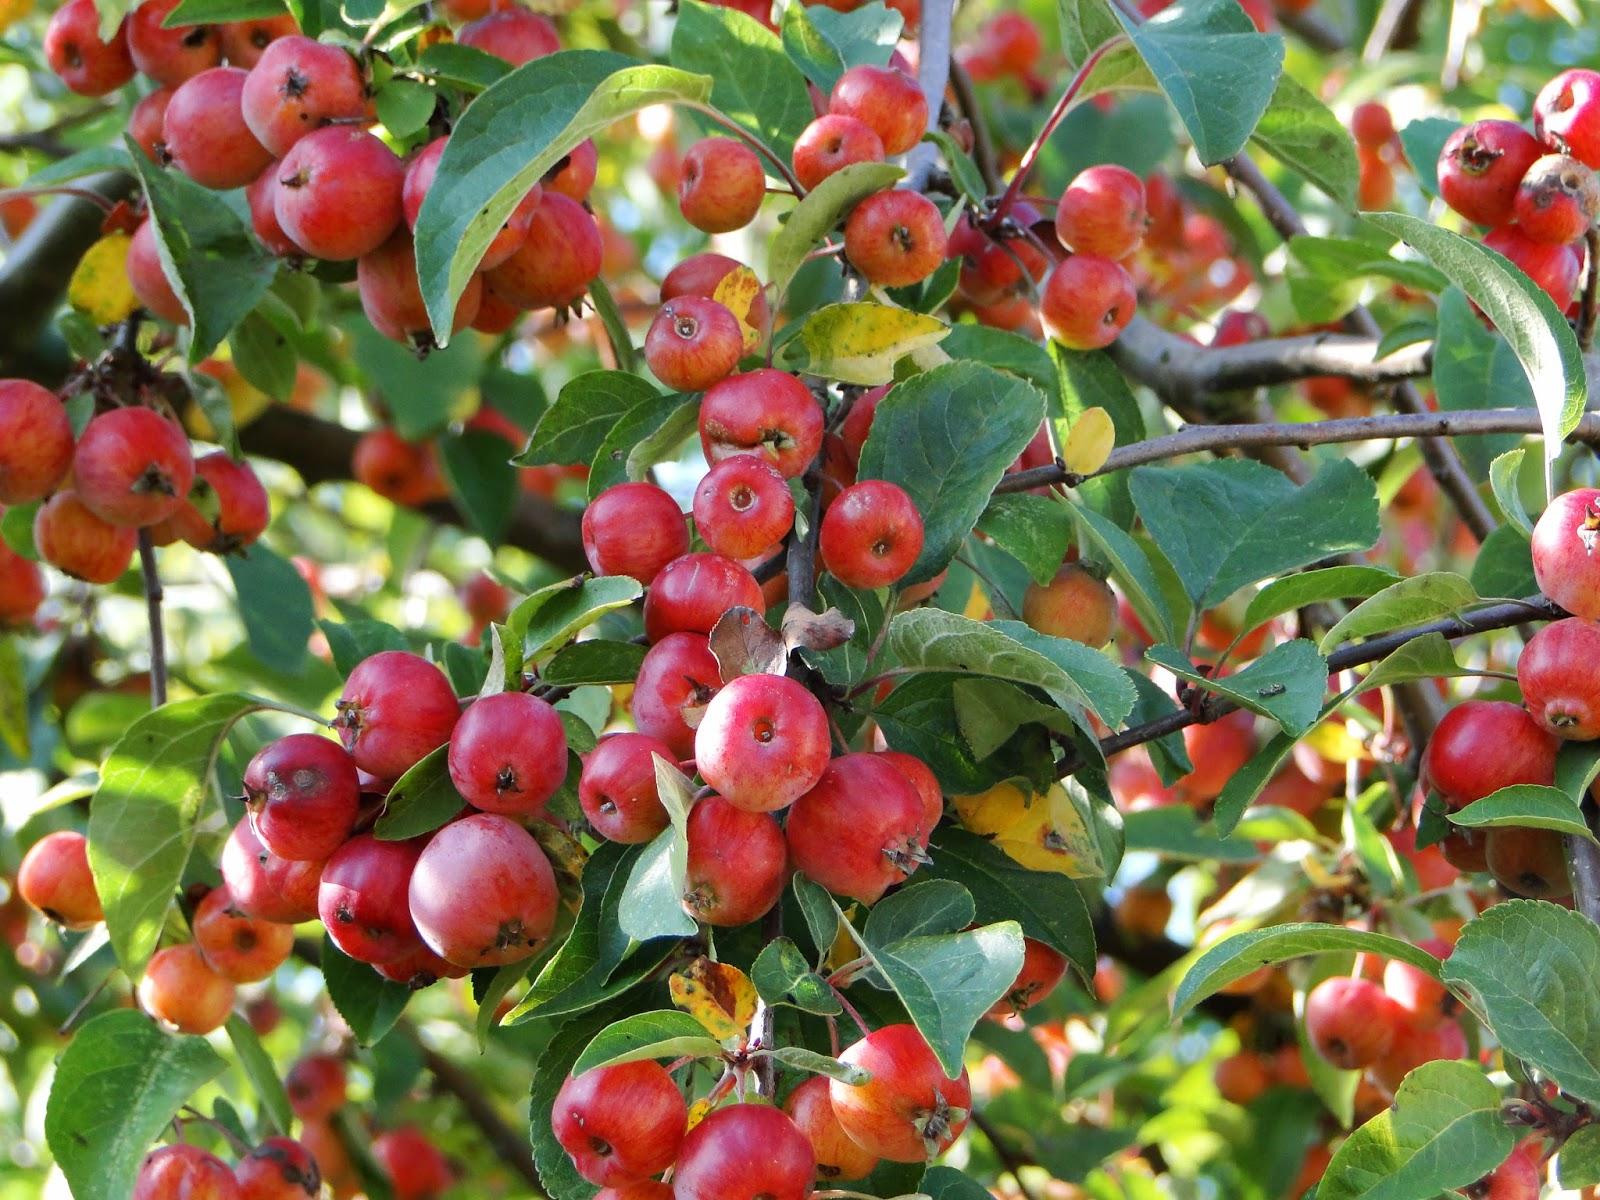 Apple tree wallpaper free download